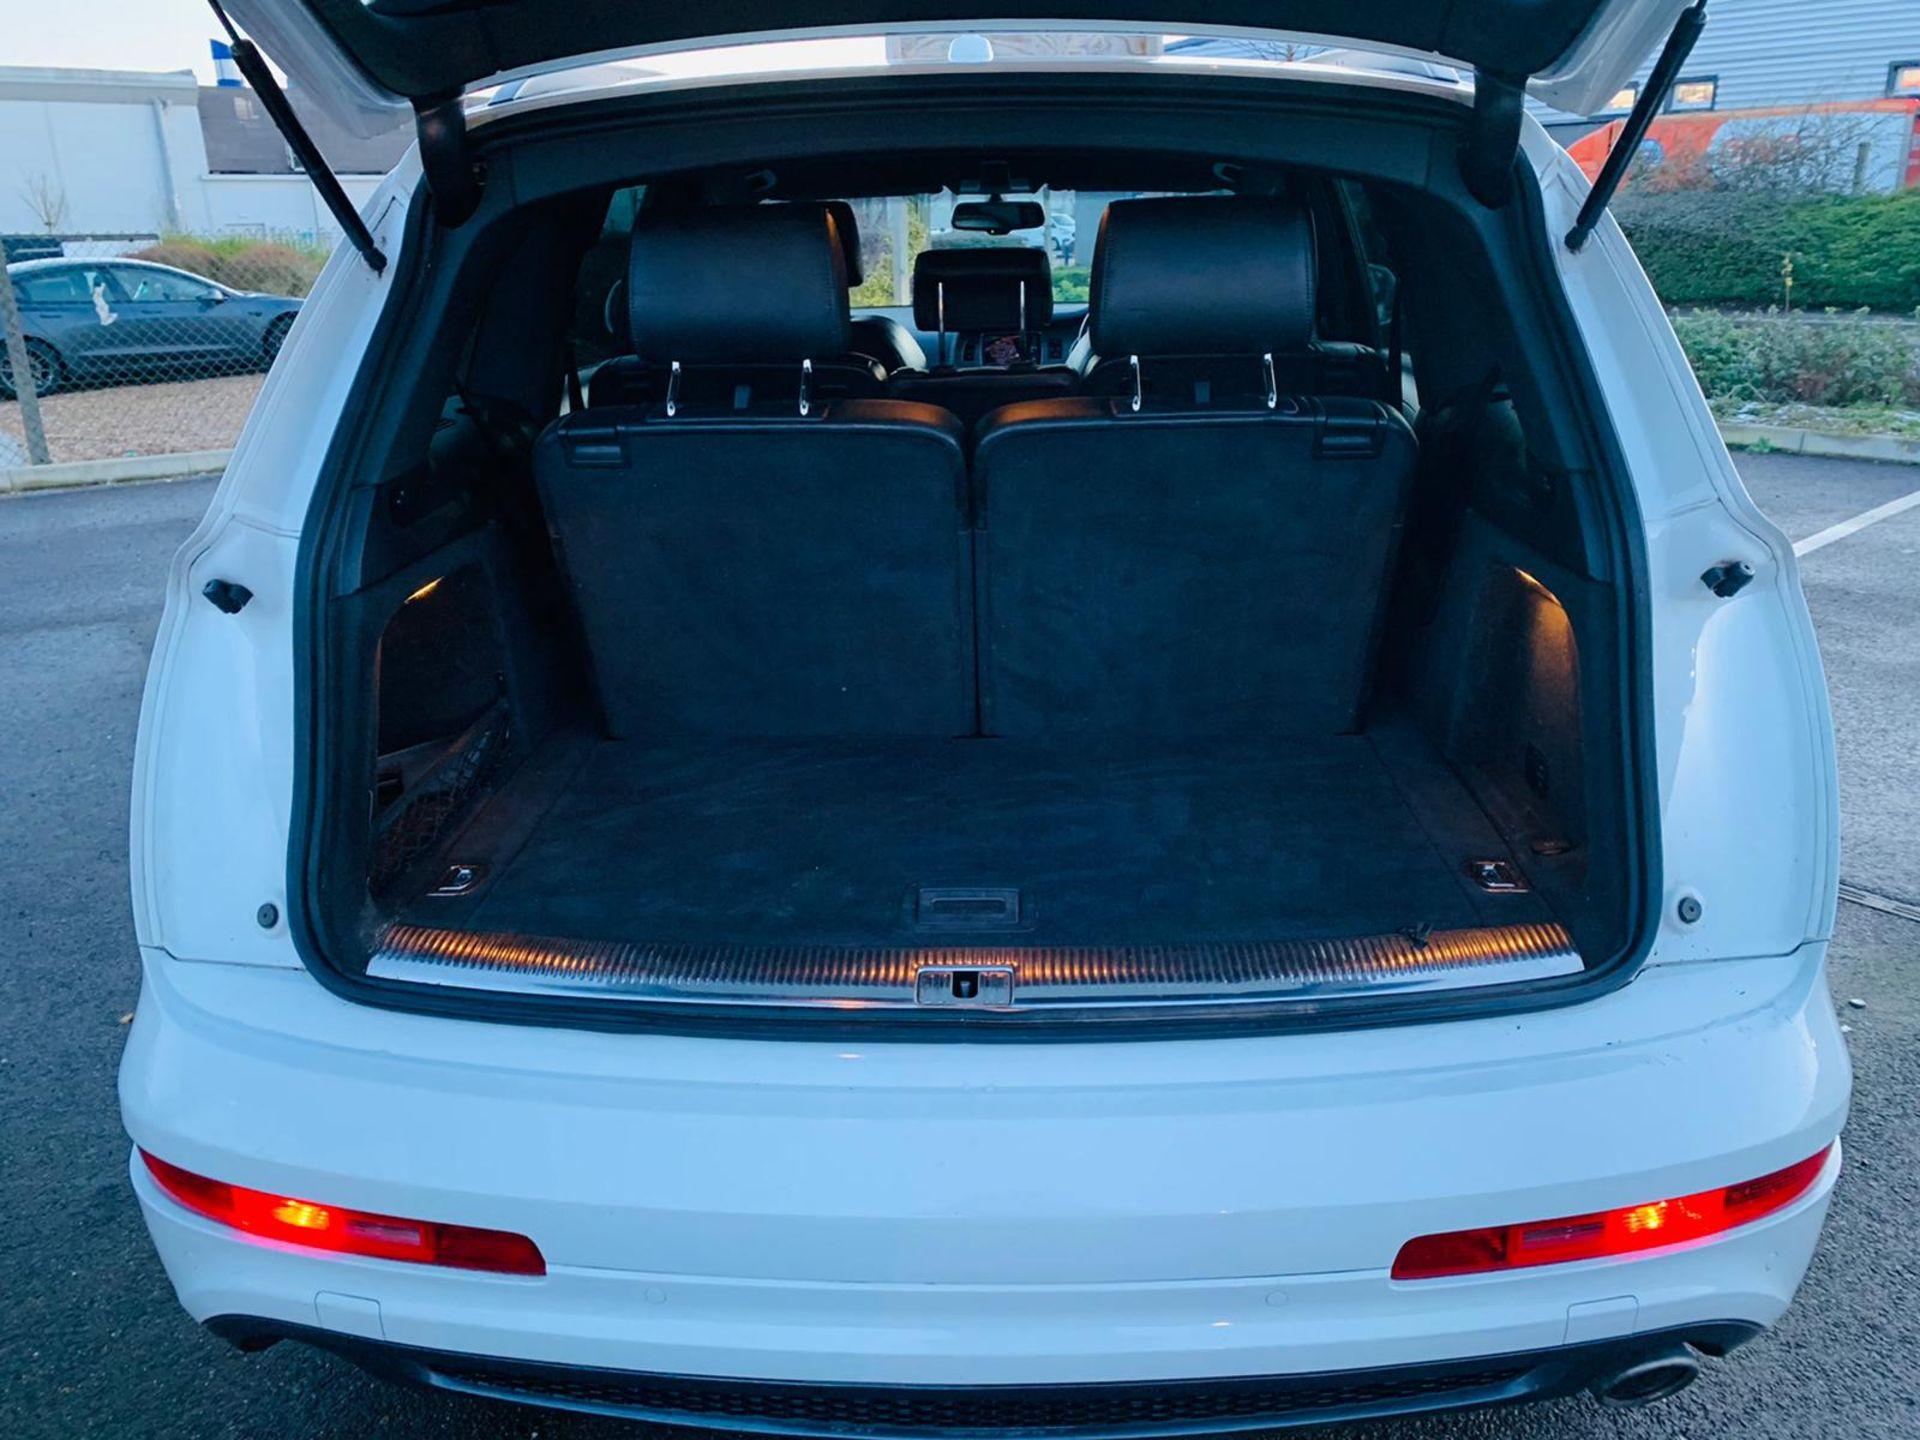 (Reserve Met)Audi Q7 3.0 TDI Quattro S Line Plus Auto (7 Seats) - 12 Reg - Only 63k Miles -Sat Nav- - Image 10 of 37